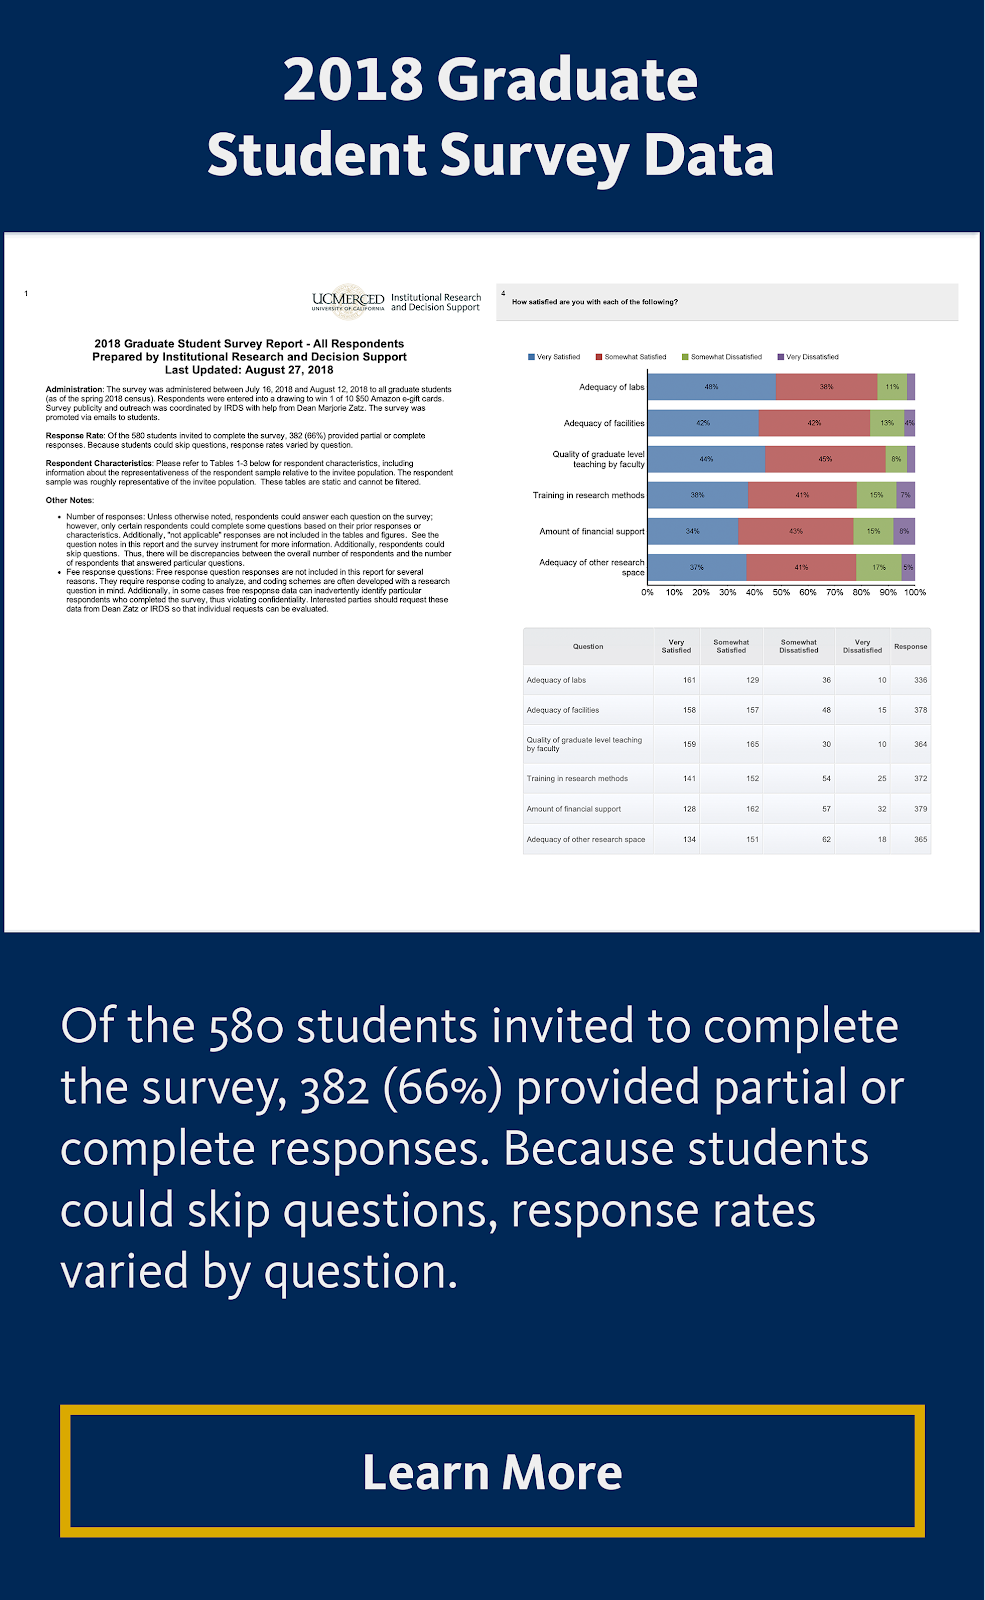 2018 Graduate Student Survey Data